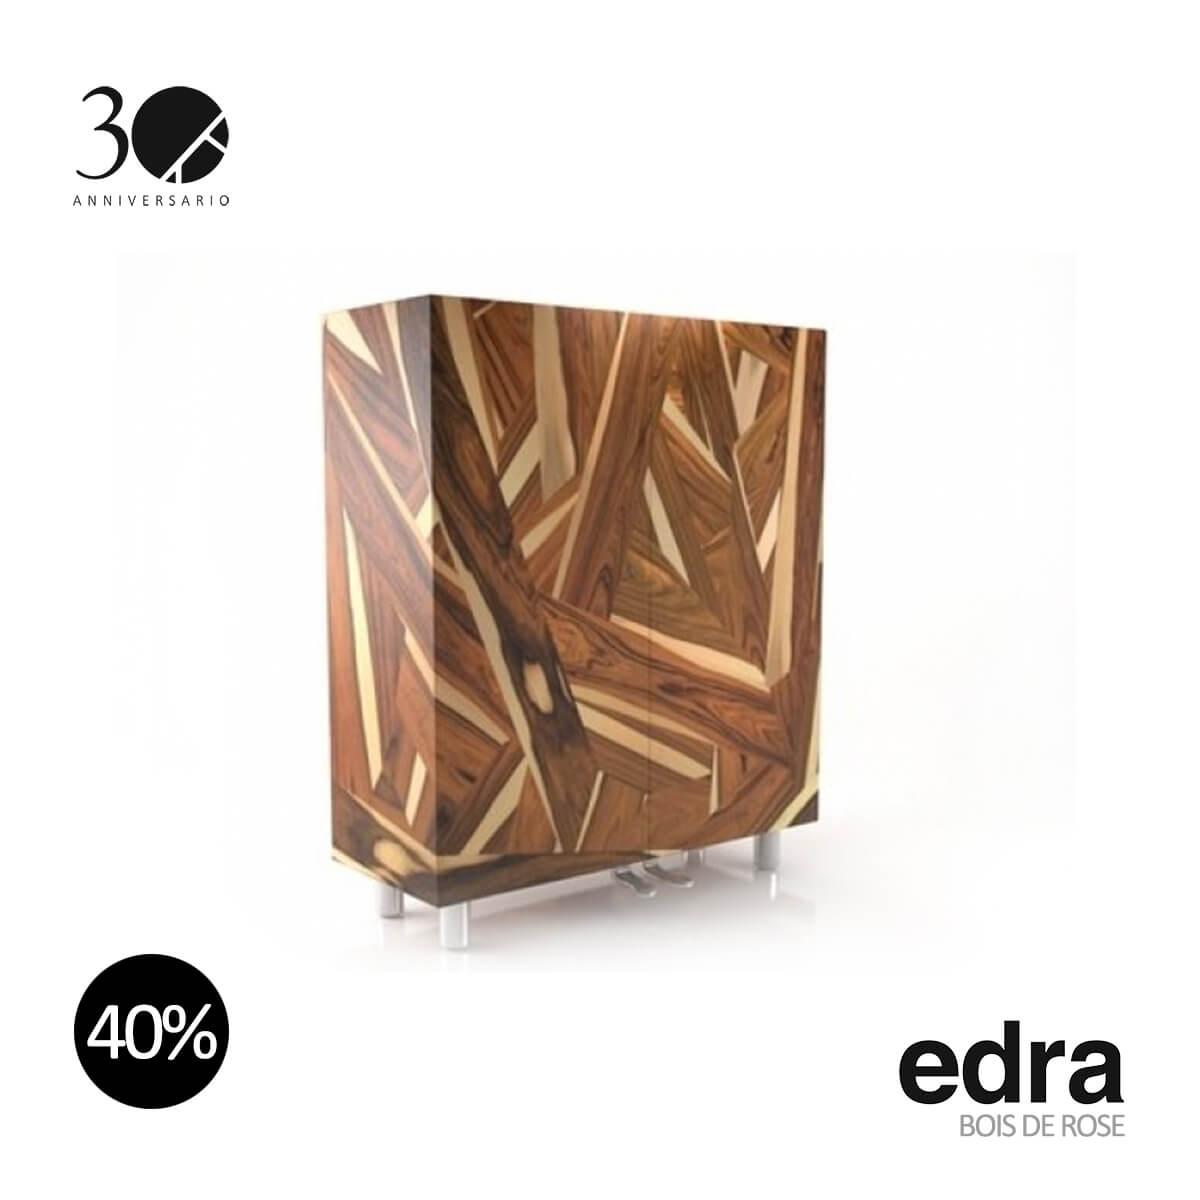 edra-bois-de-rose